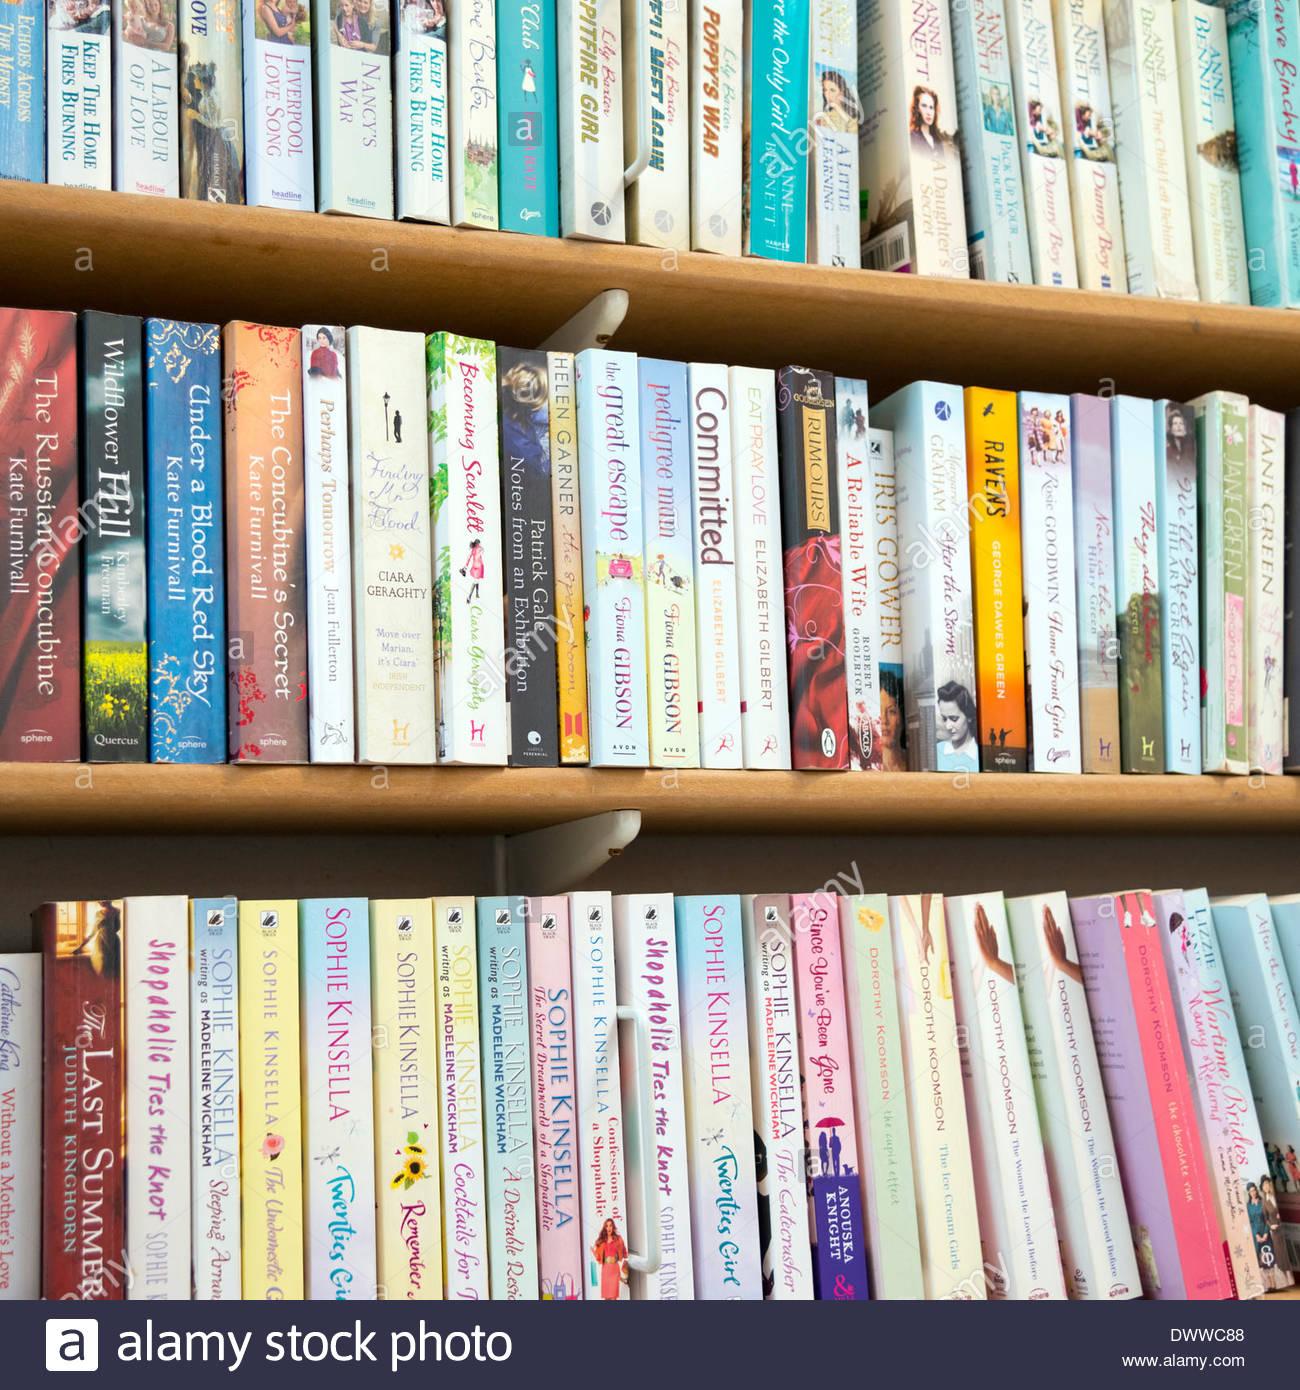 Paperbacks in rows on a bookshelf, UK. - Stock Image